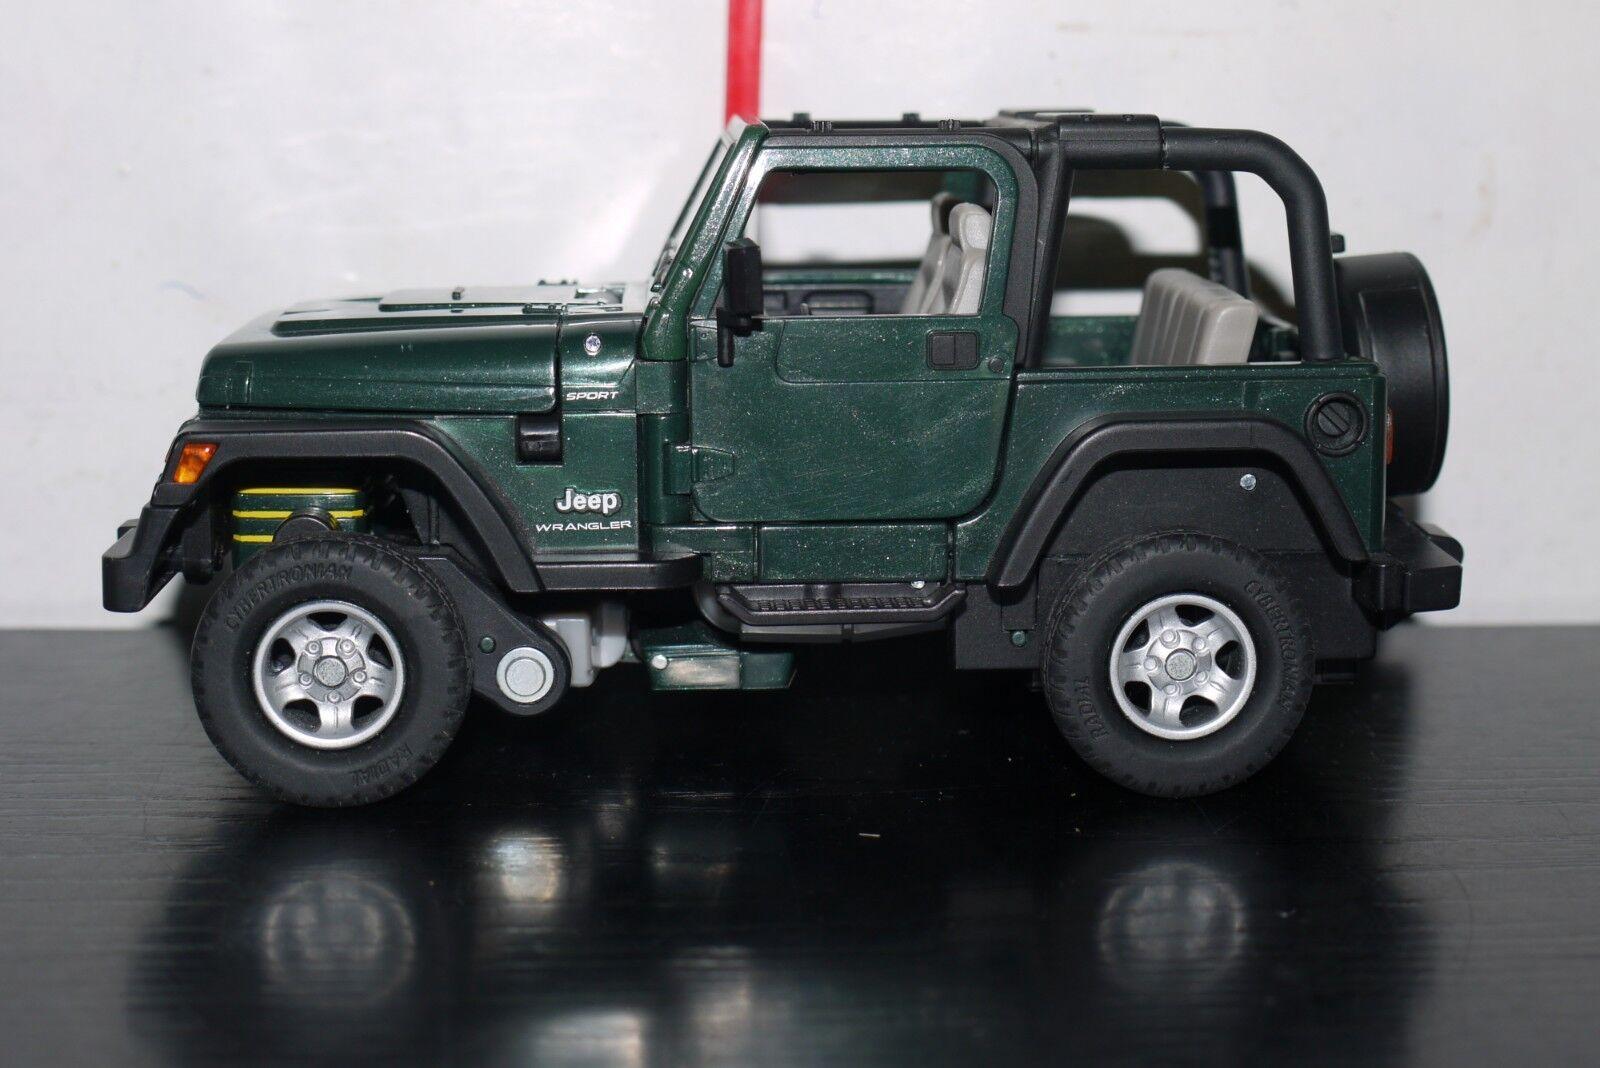 Hound Jeep Wrangler FIGURE Alternators 100% complete Transformers